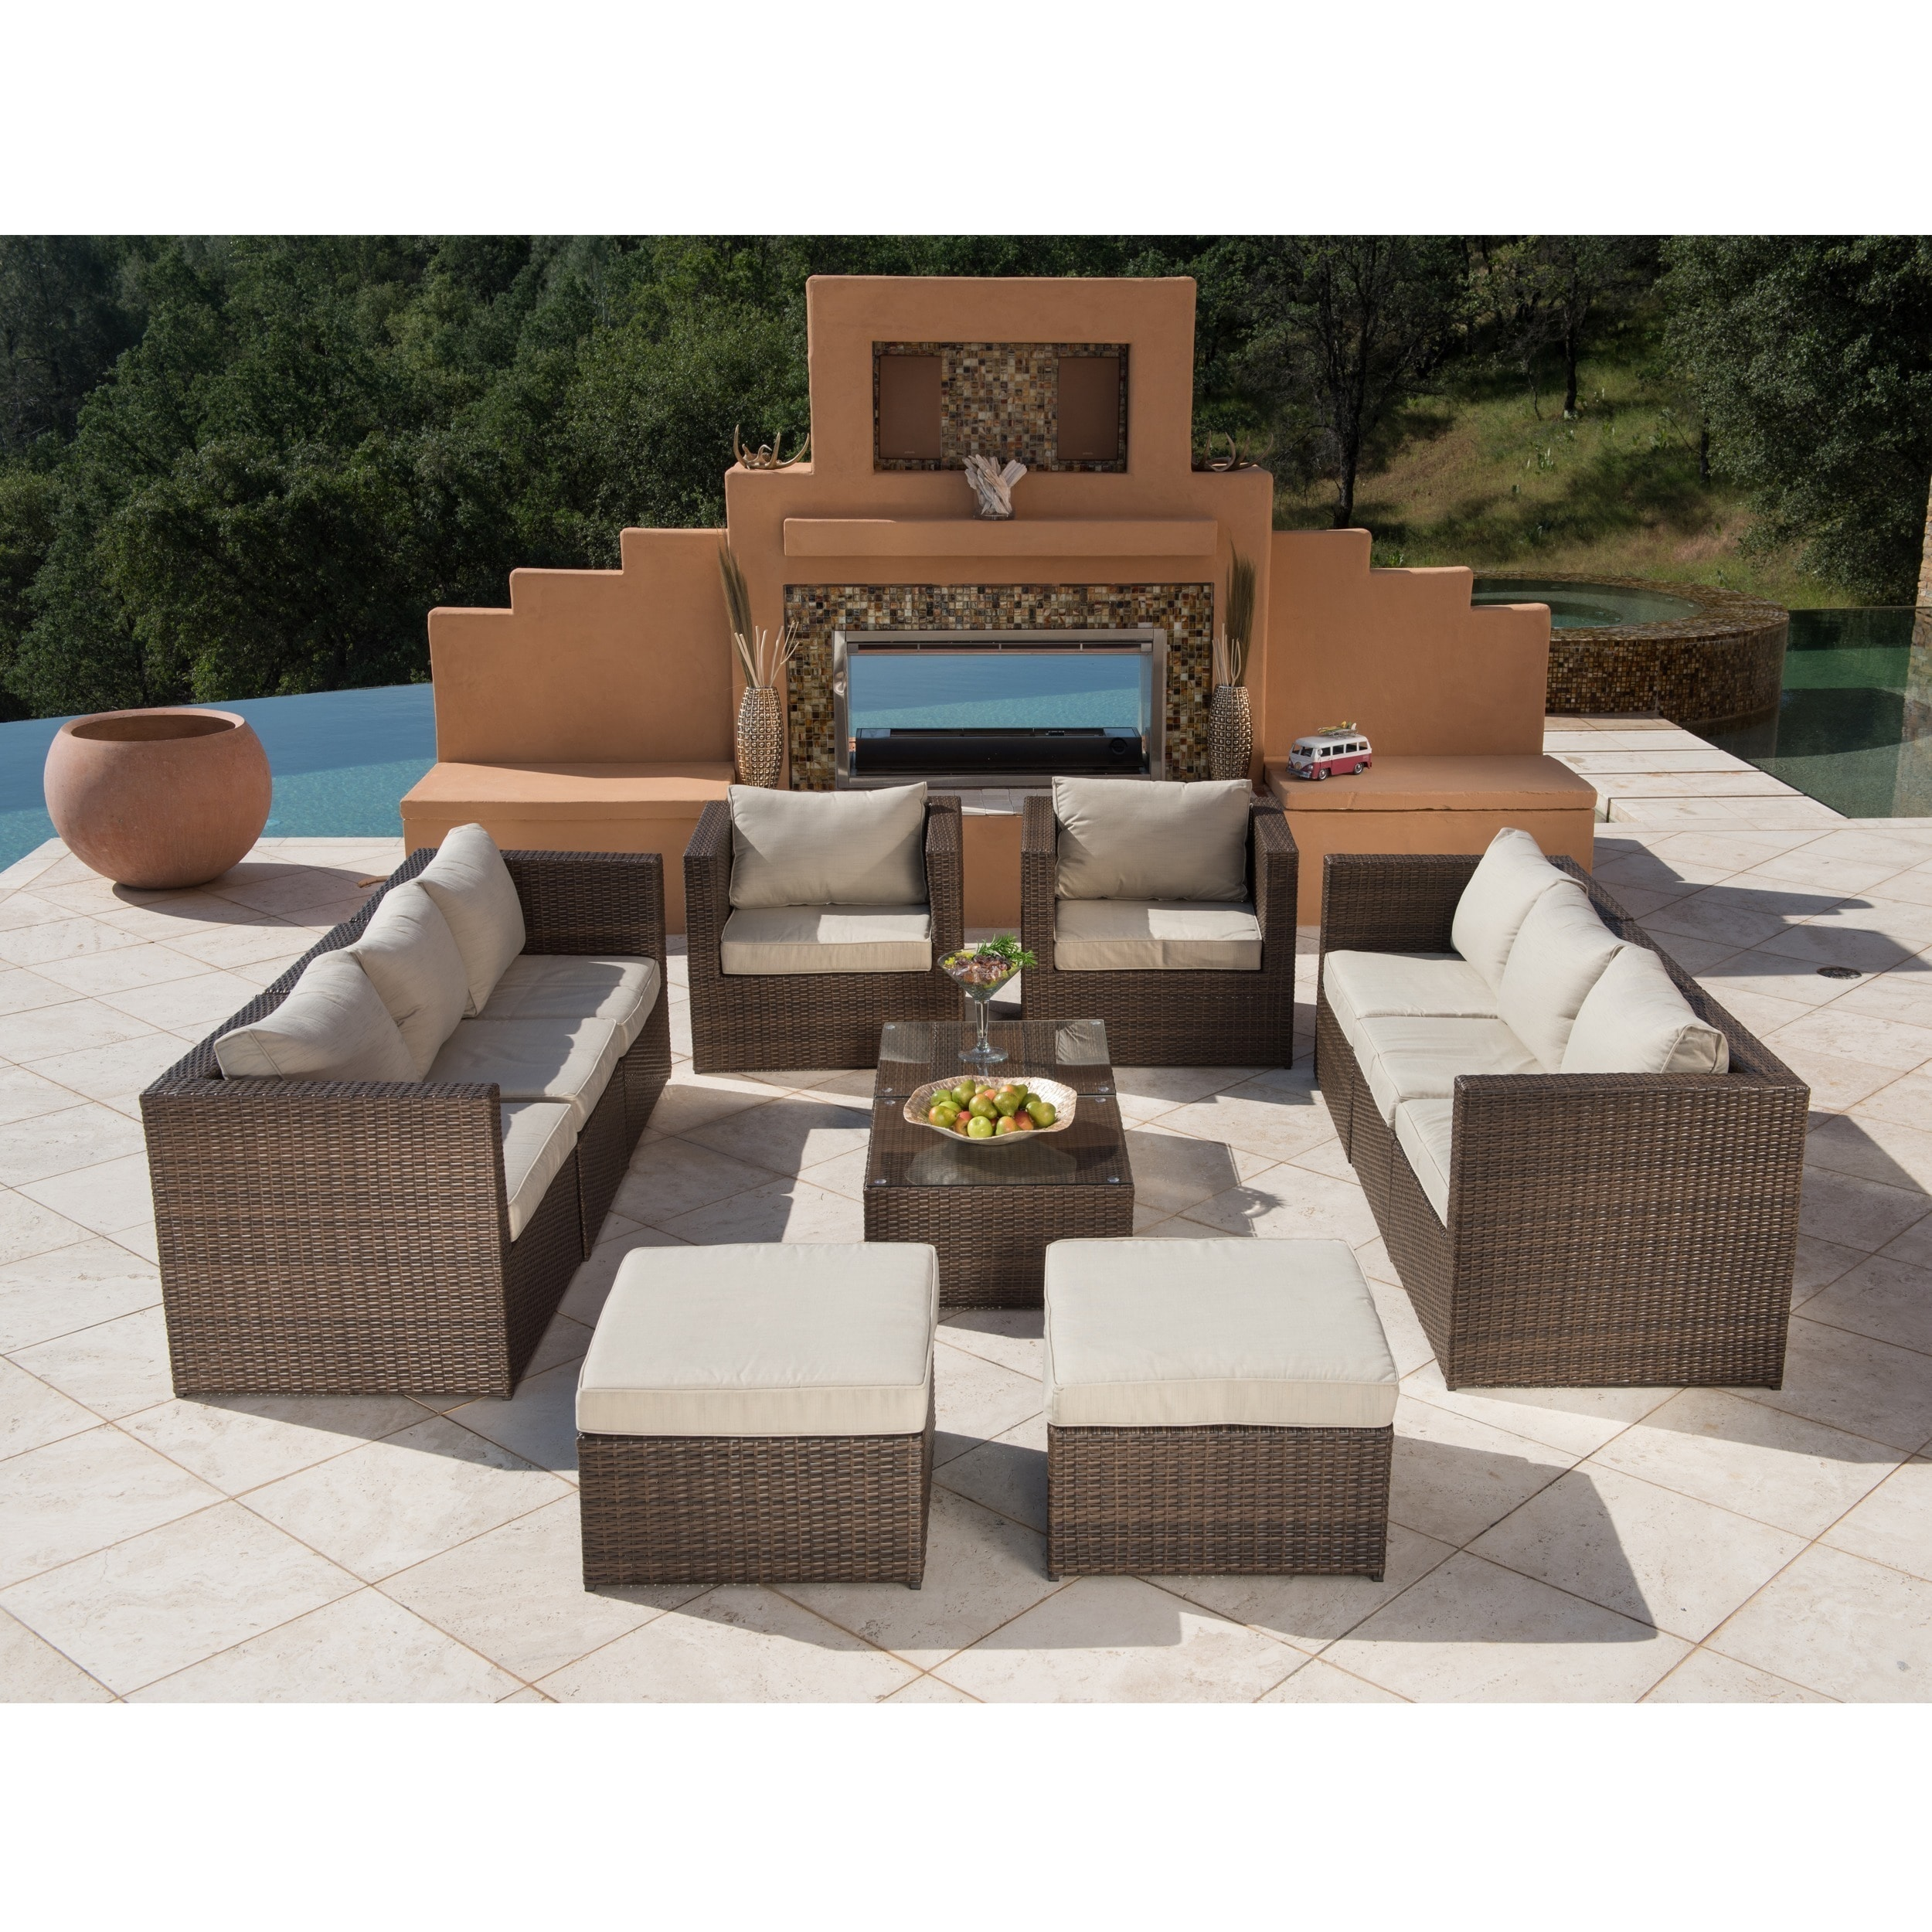 Corvus Trey 12 piece Dark Brown Wicker Patio Furniture Set with